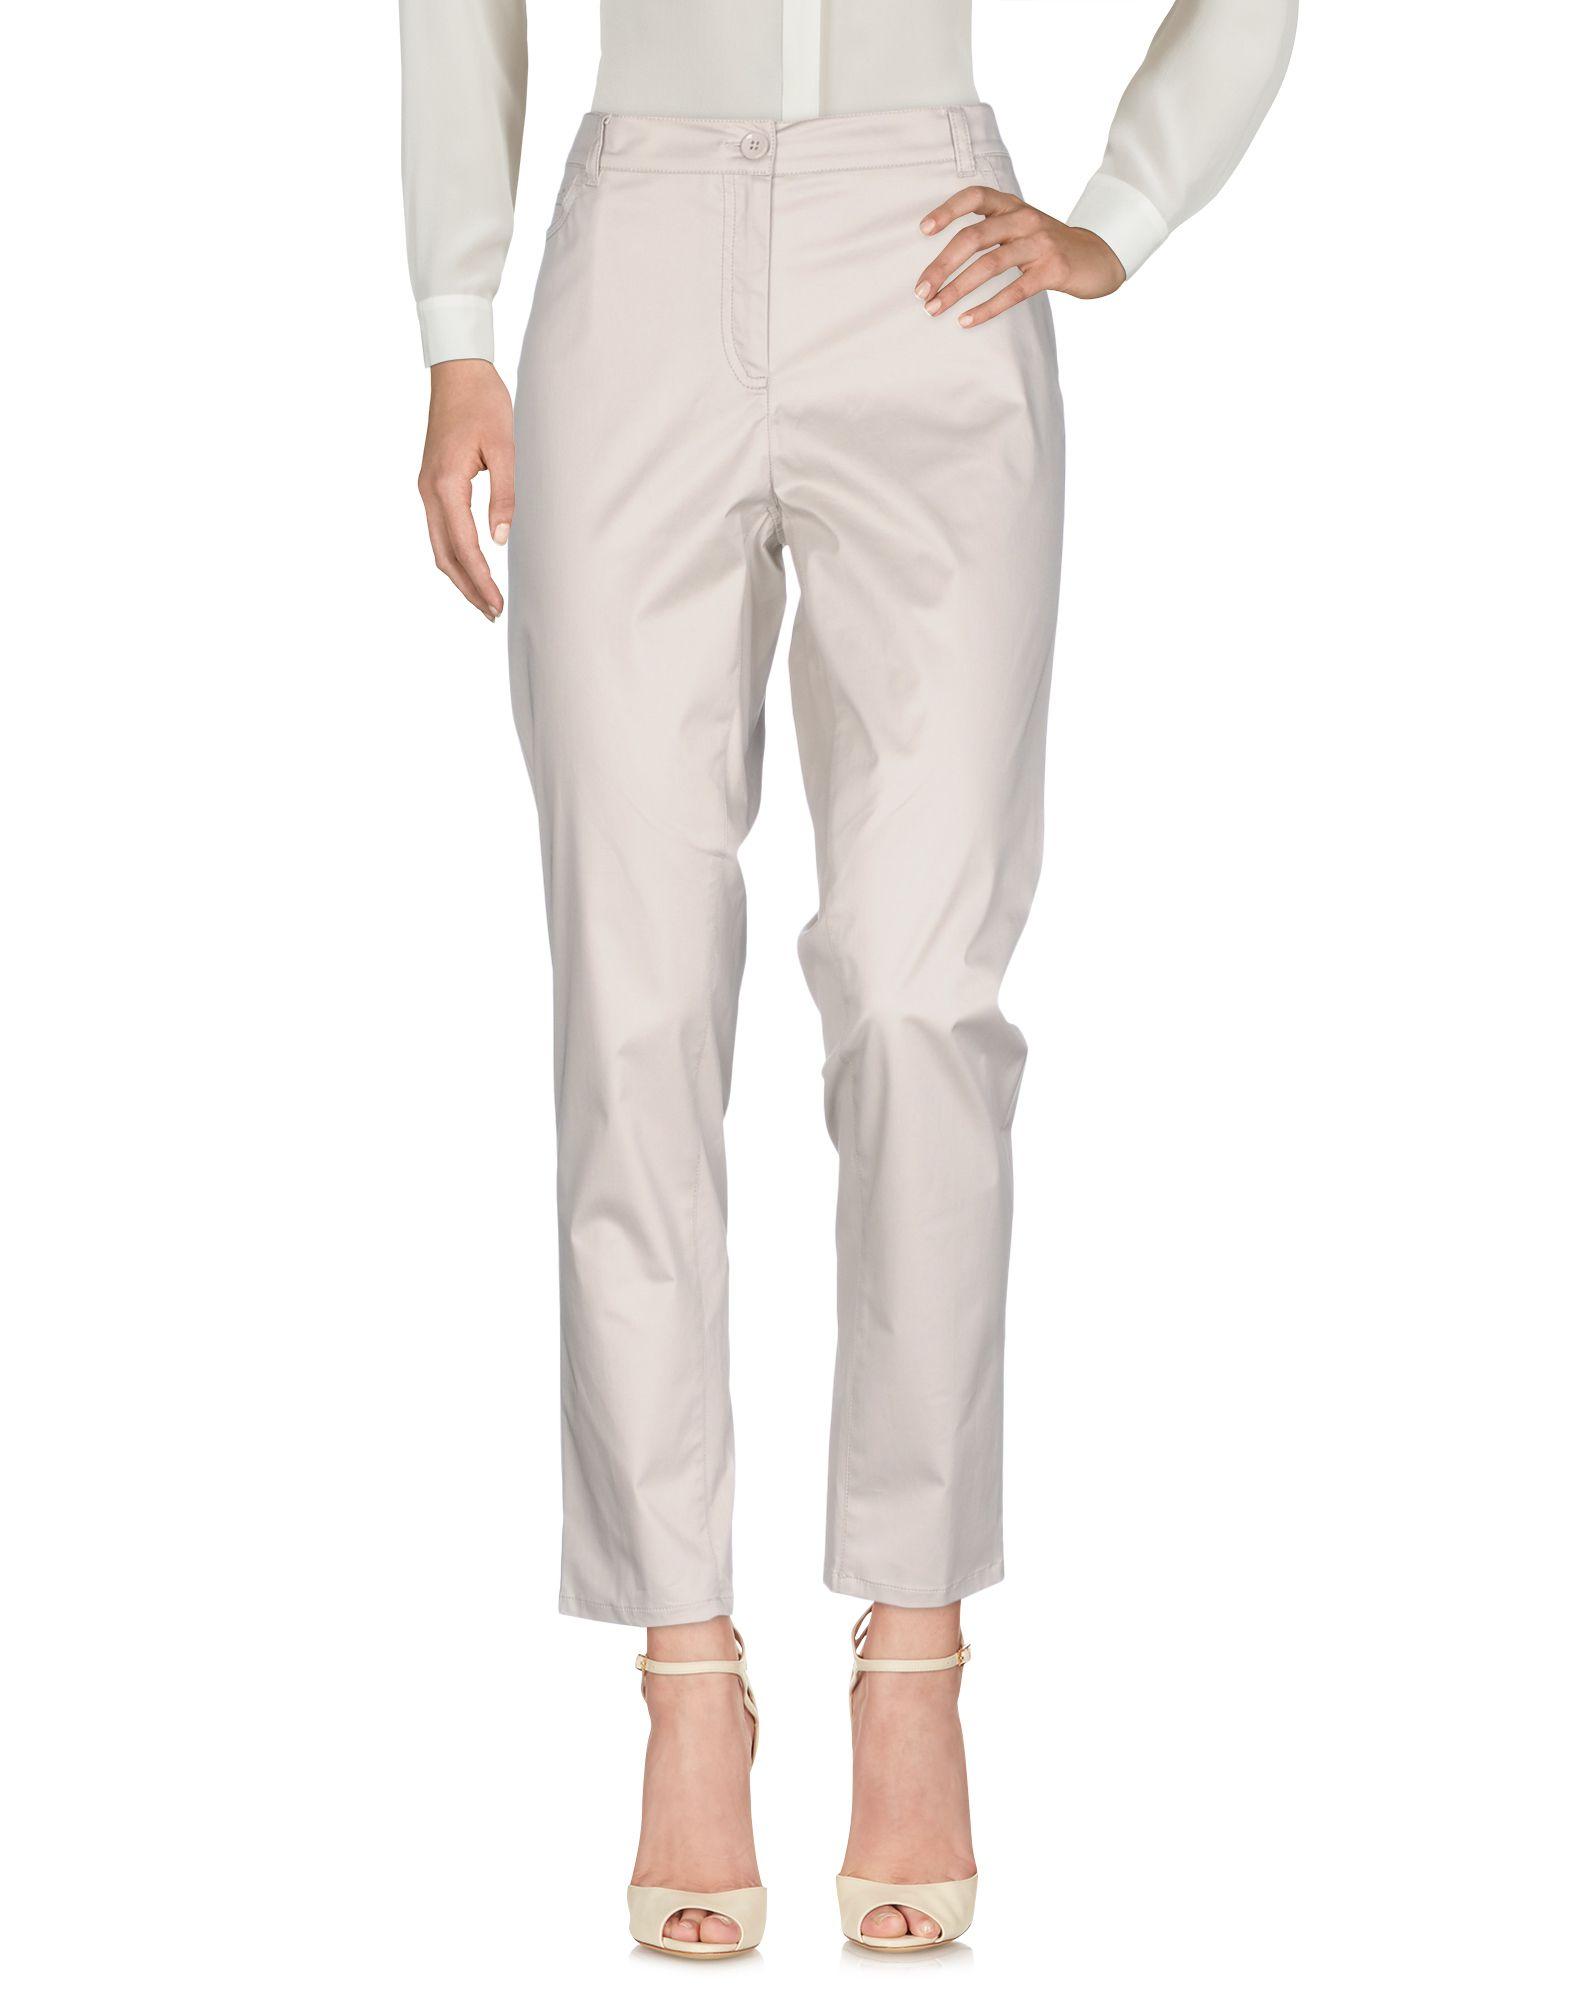 PAOLA ROSSINI Повседневные брюки paola rossini пиджак